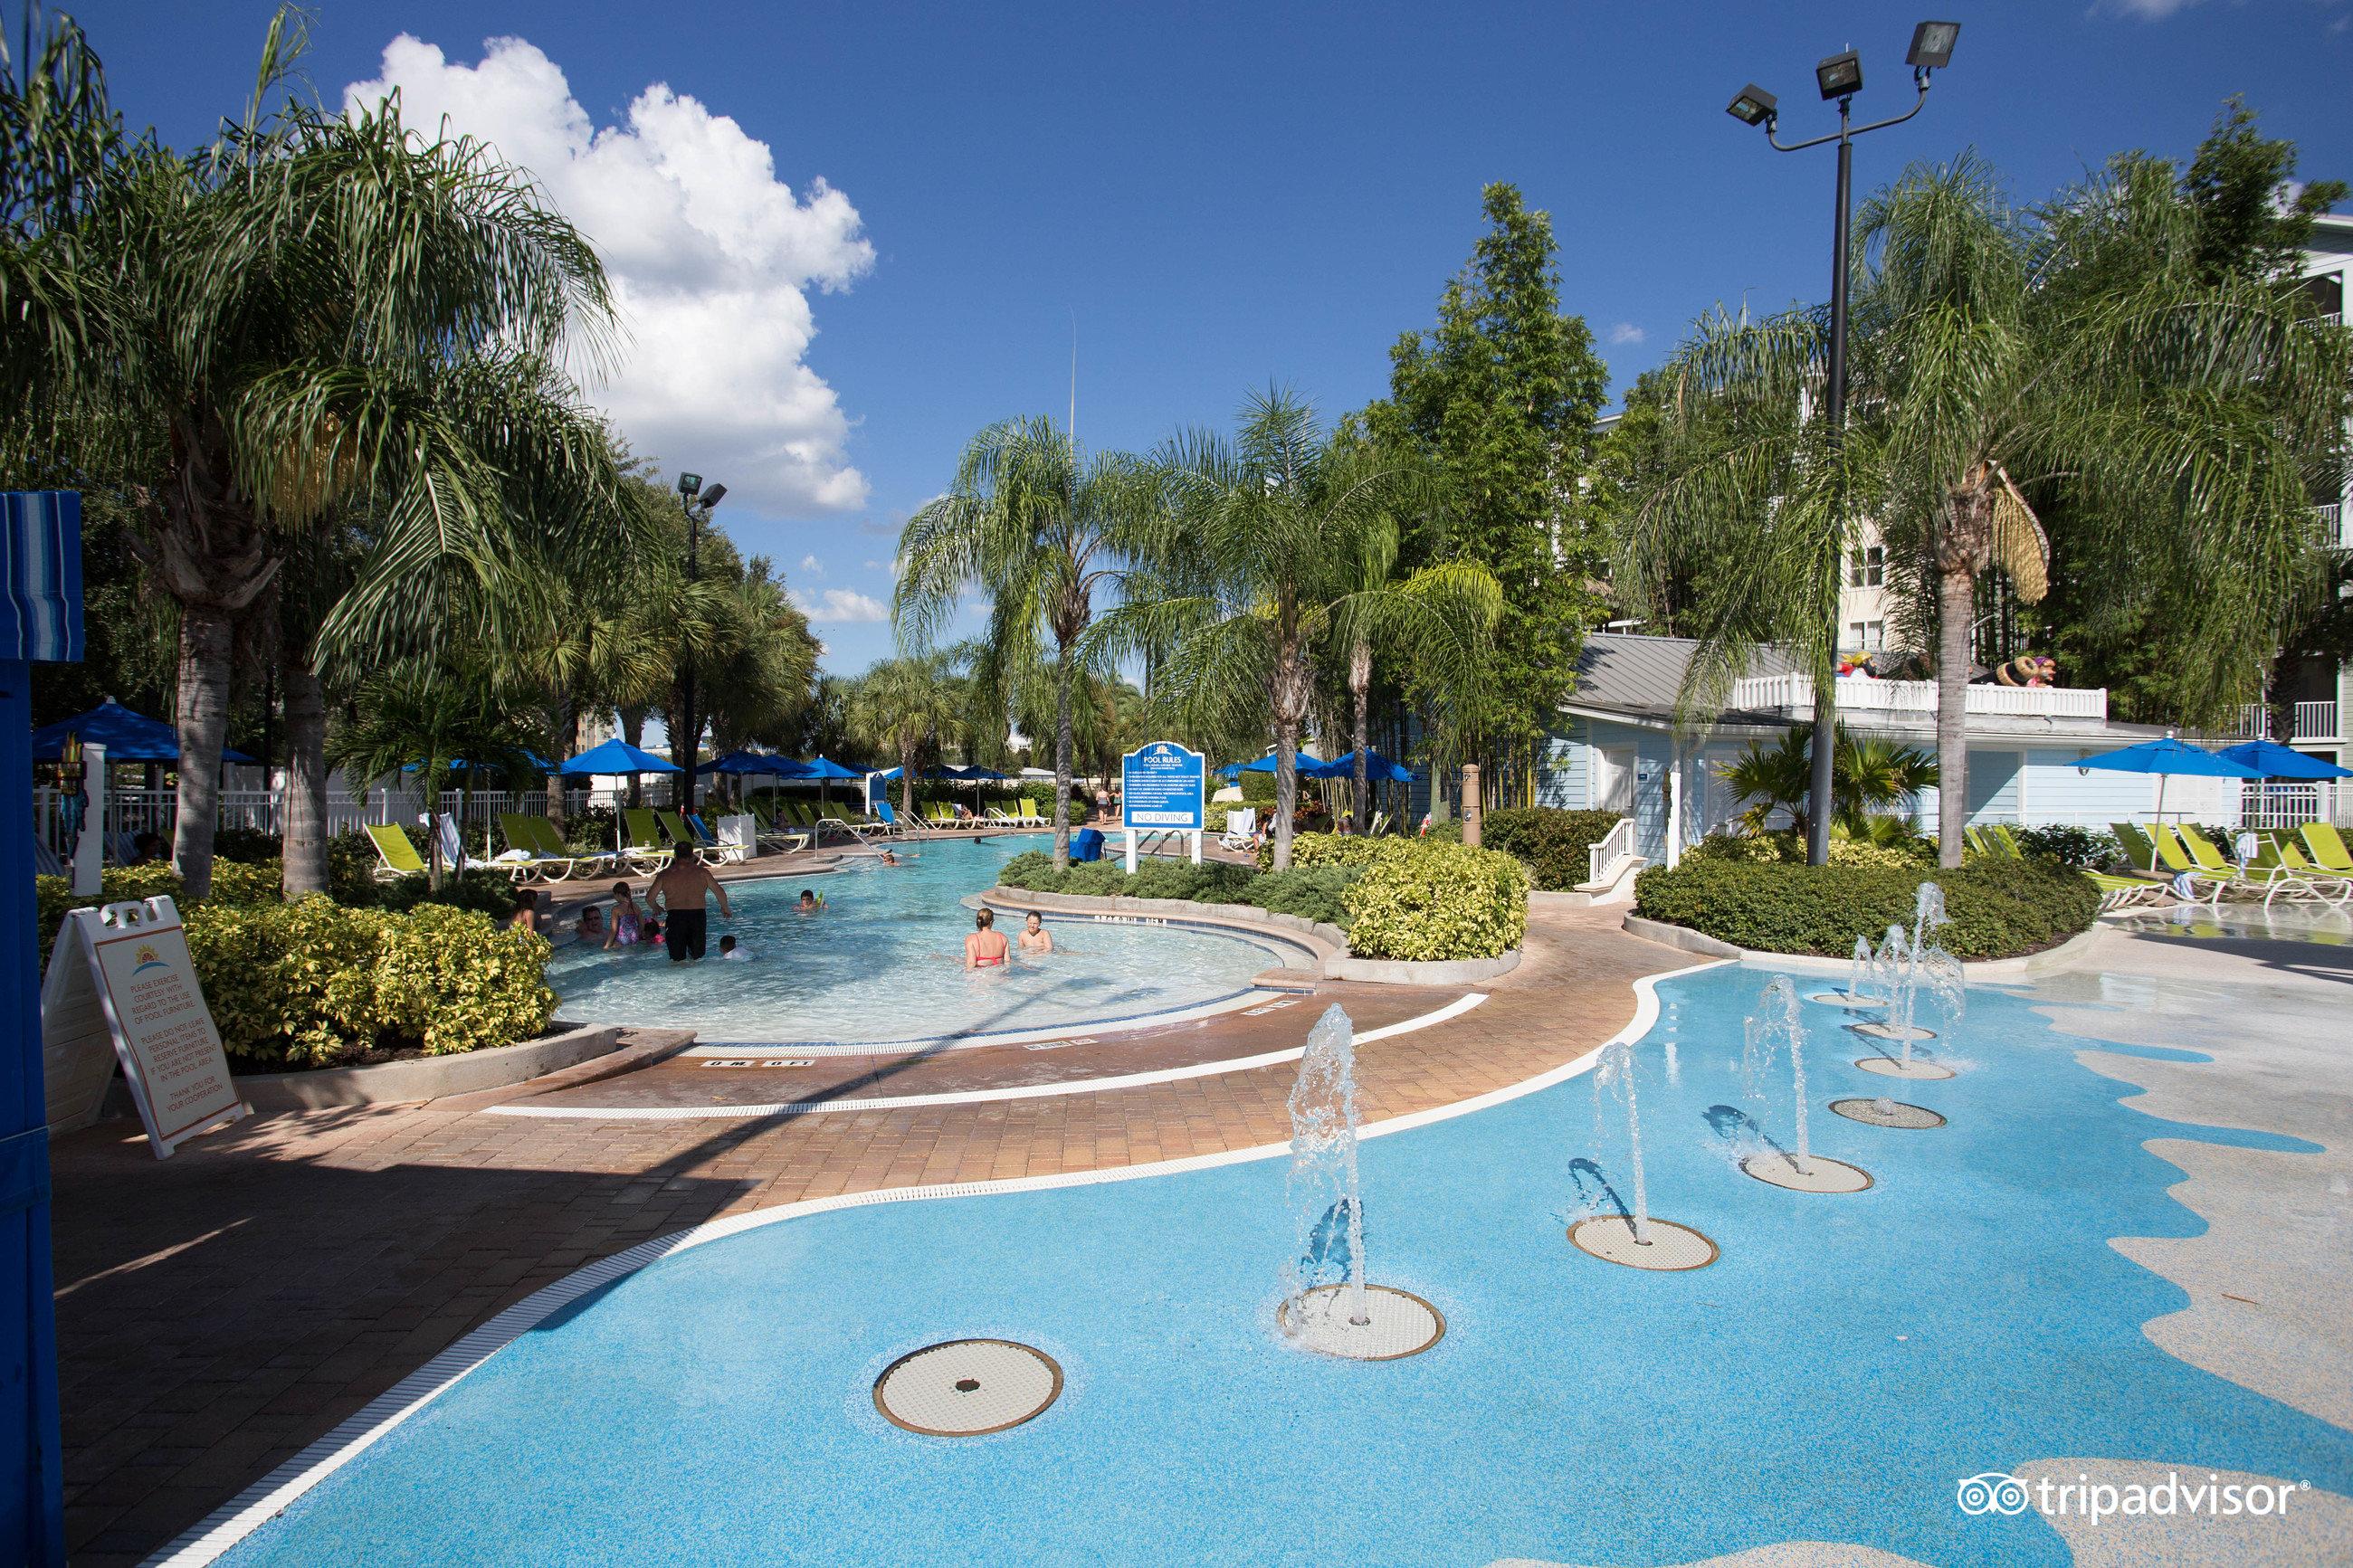 Marriott s Harbour Lake Orlando FL 2018 Hotel Review & Ratings